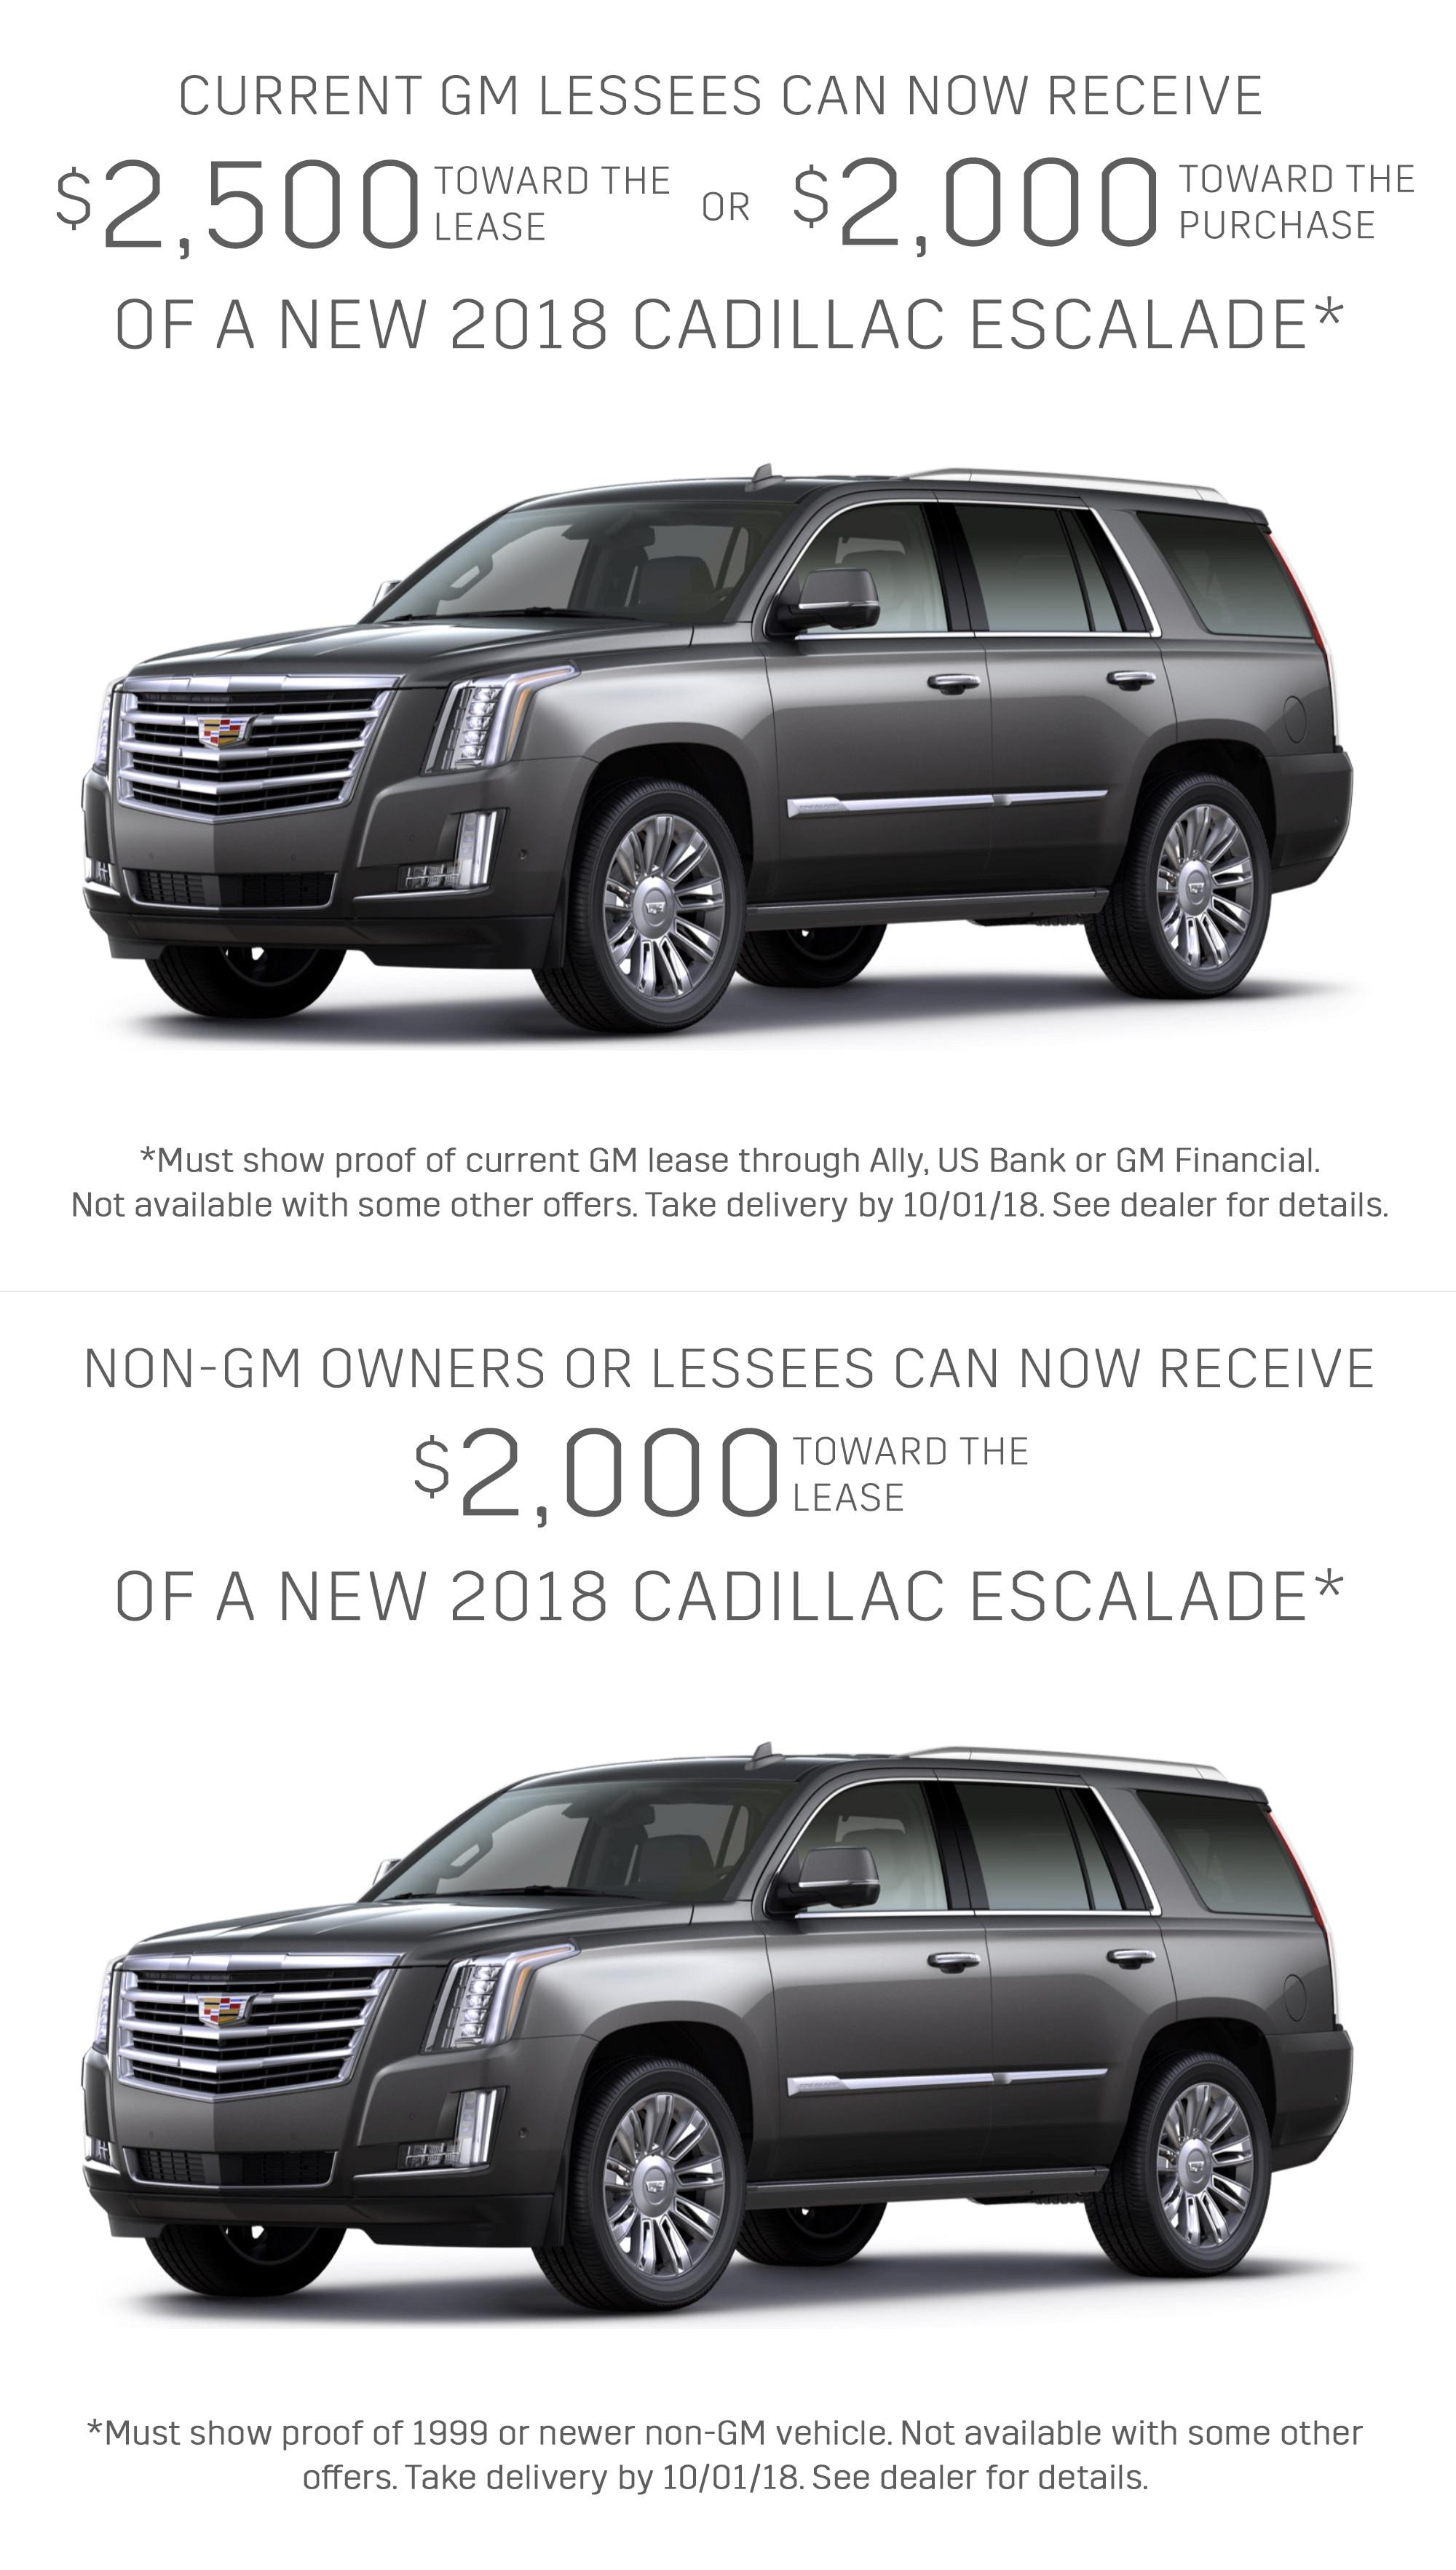 03 escalade haynes manual sample user manual u2022 rh userguideme today 2015 Cadillac Escalade 2003 Cadillac Escalade